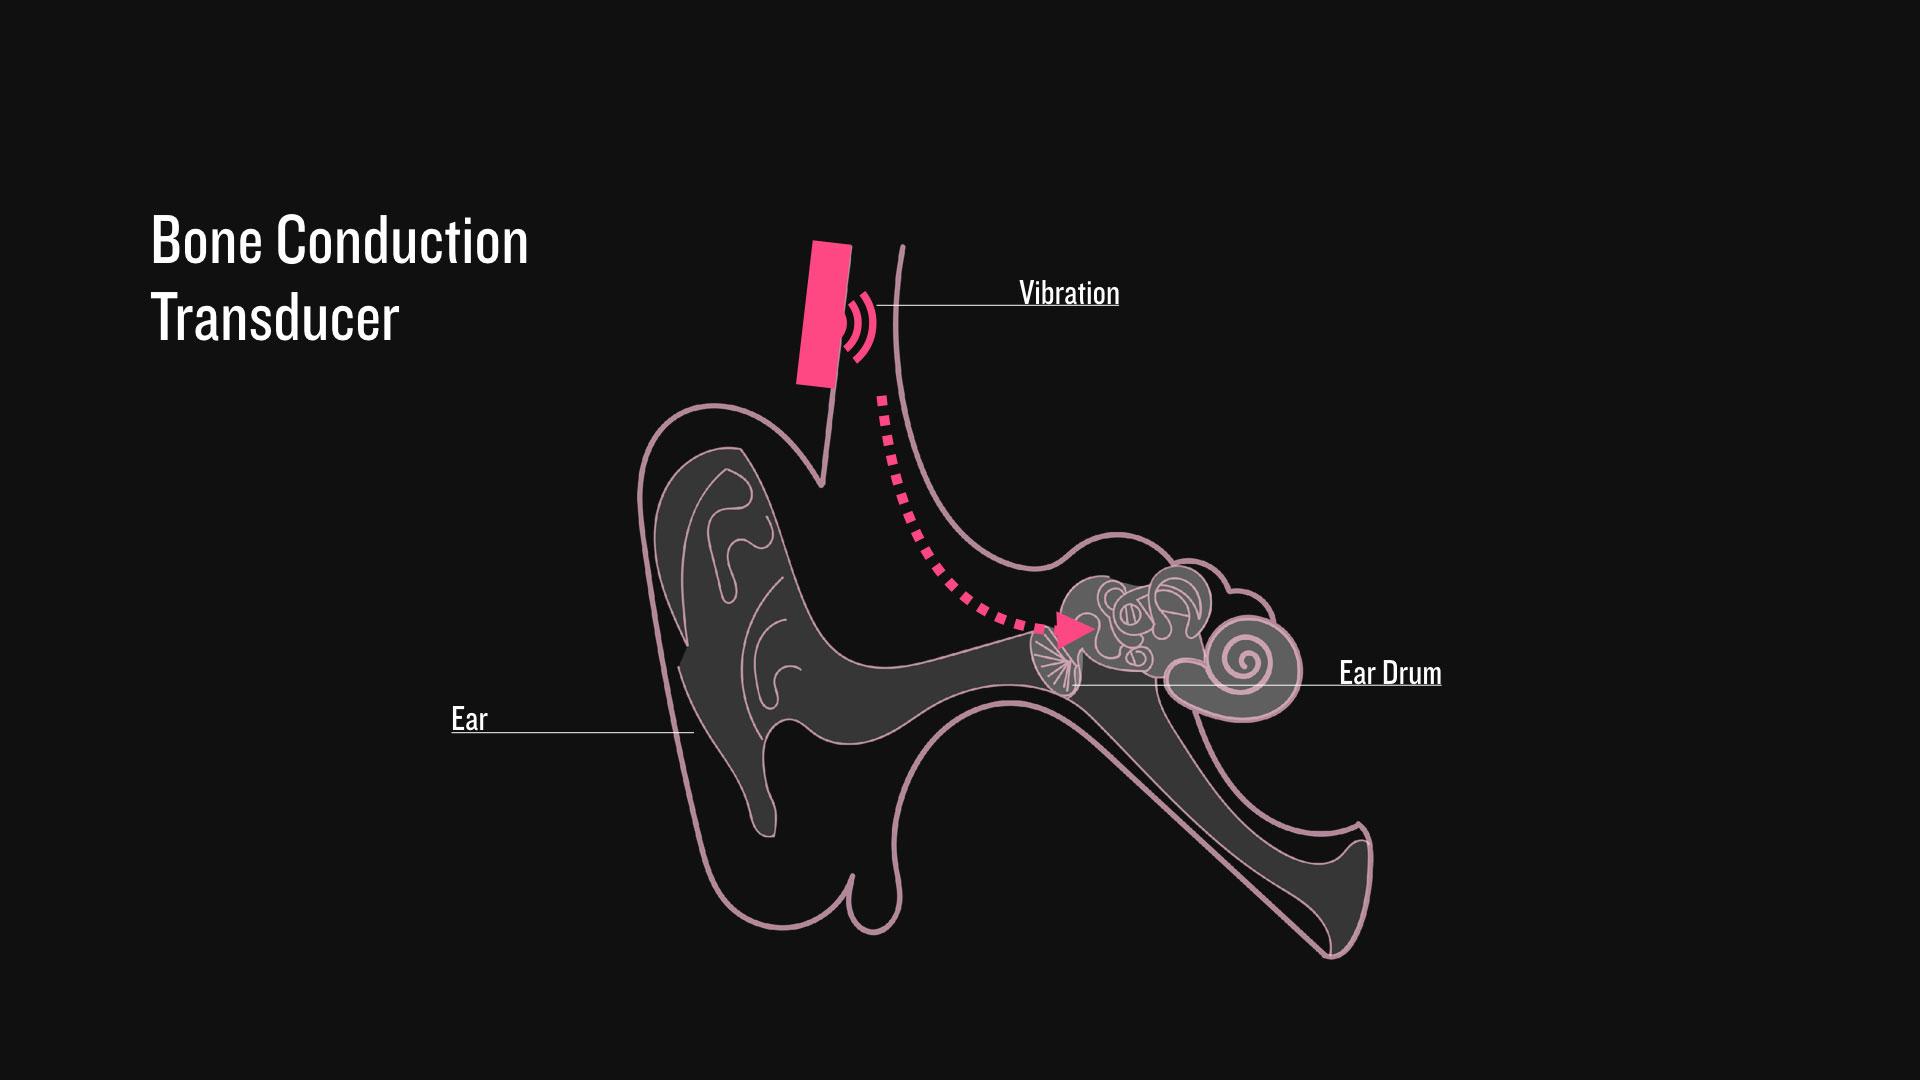 Tamura_Xenophone_3_Diagram_BoneConduction.jpg